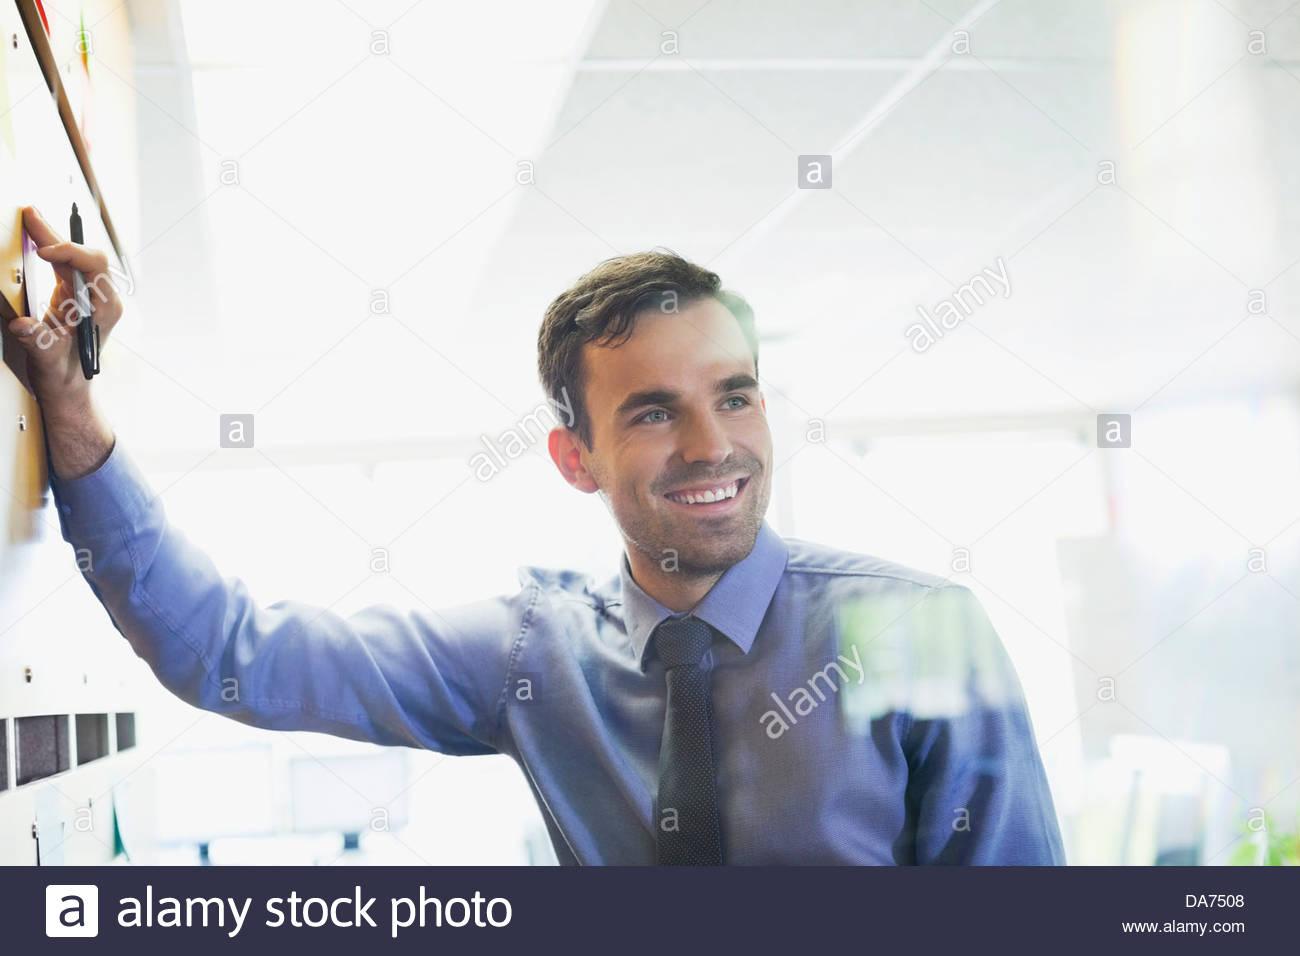 Imprenditore sorridente allegando una nota adesiva alla parete Immagini Stock